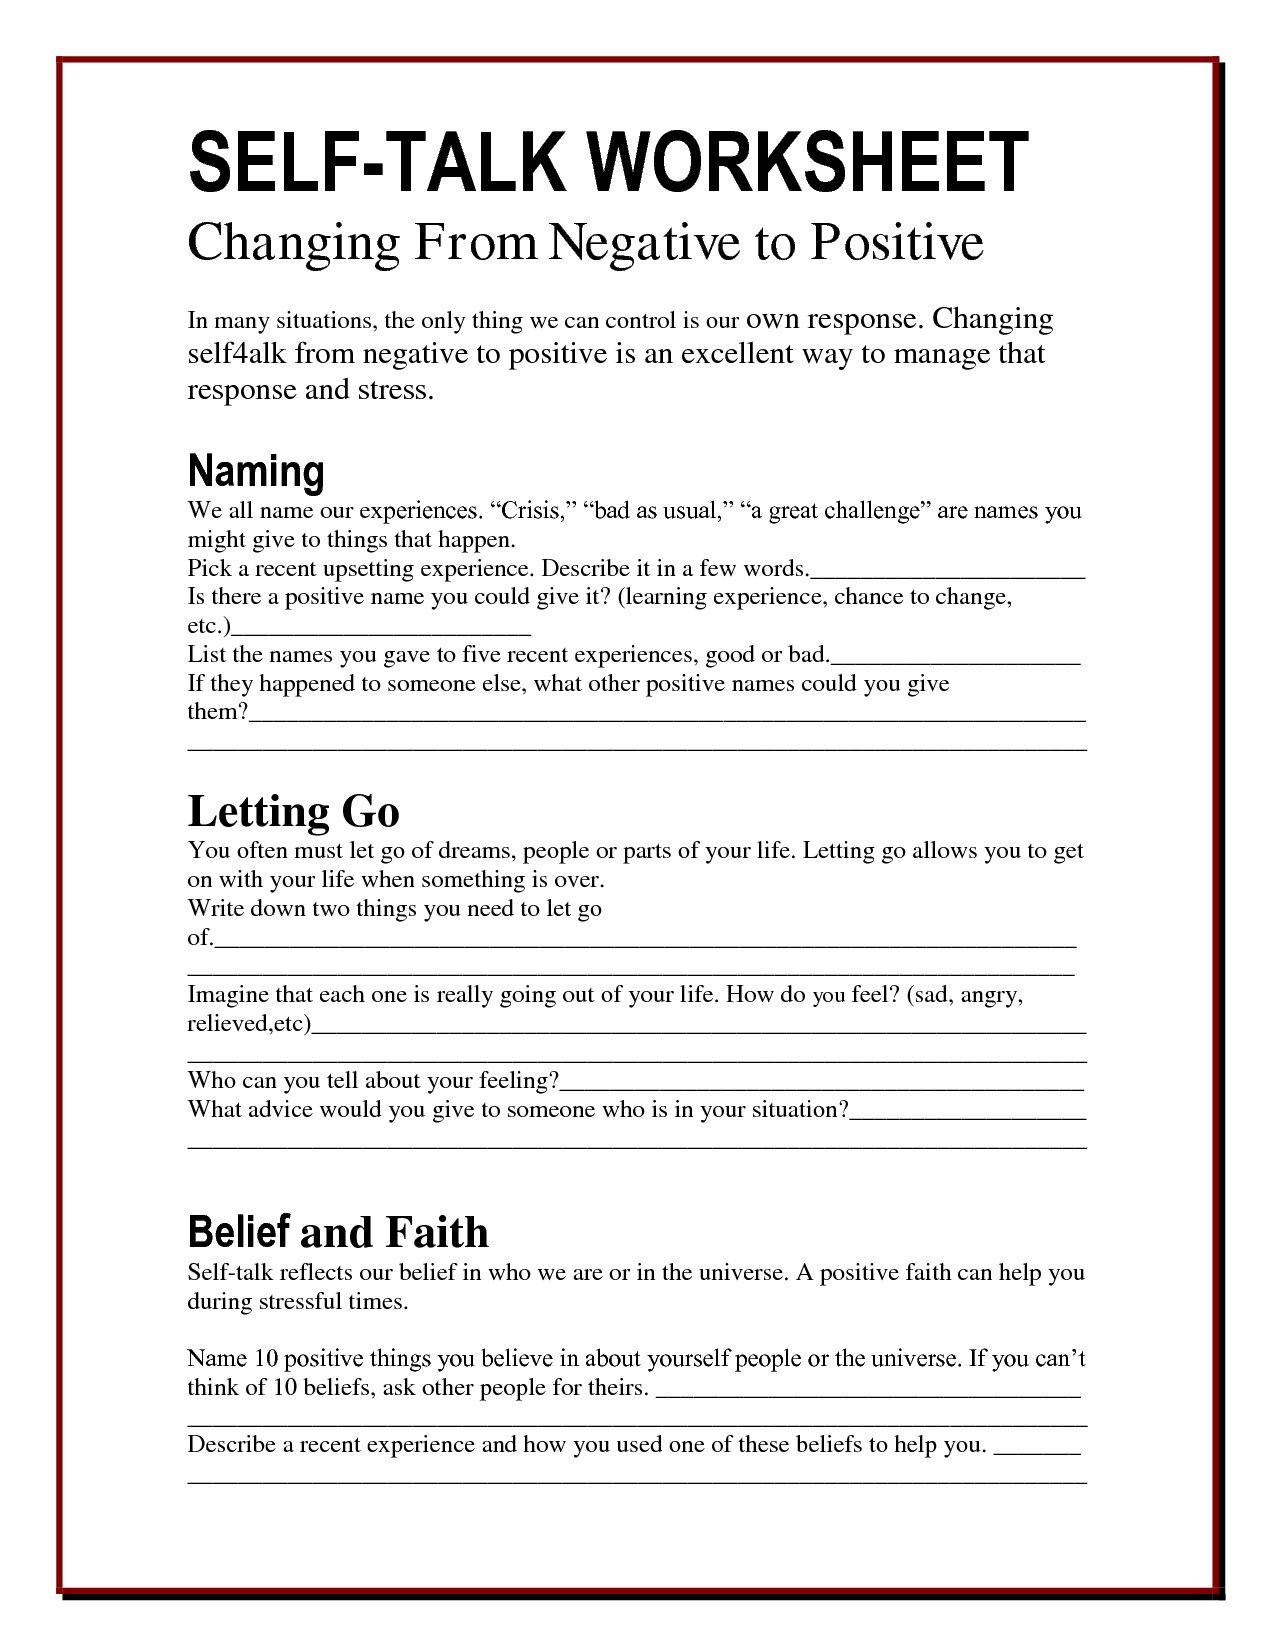 Self Esteem And Addiction Worksheets   Printable Worksheets